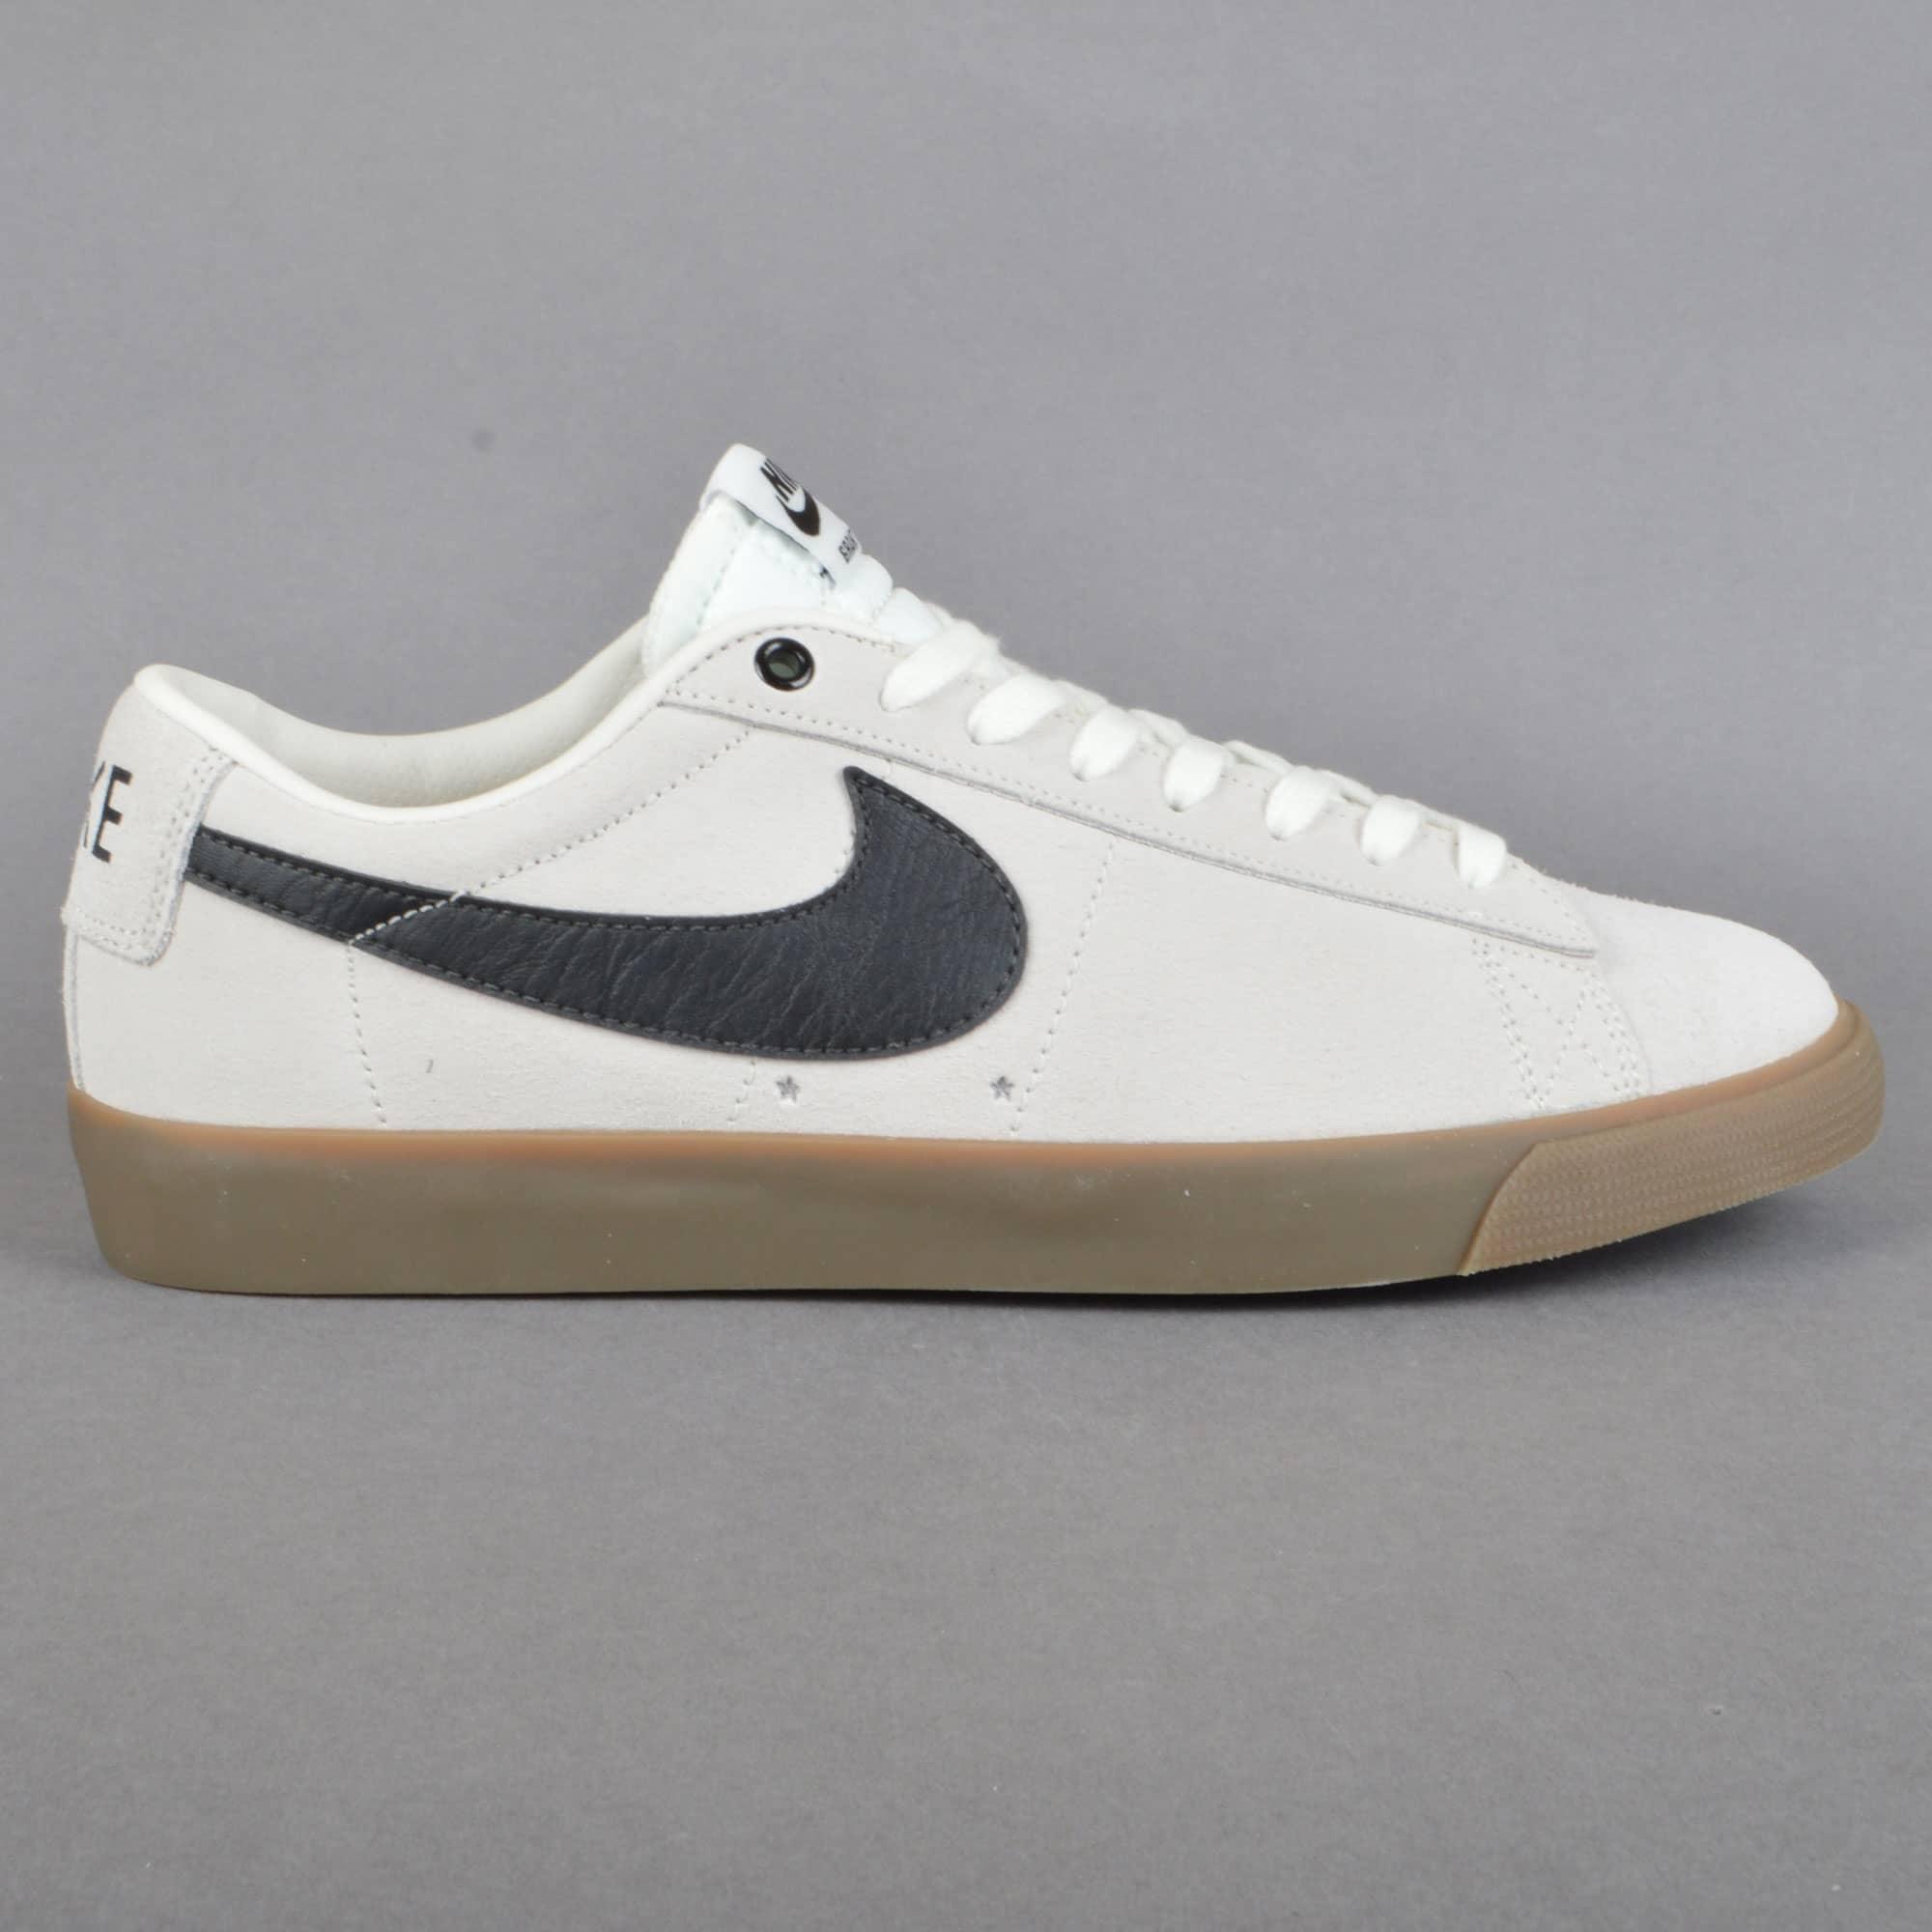 Nike SB Blazer Low GT Skate Shoes - Ivory/Black-Gum Light Brown